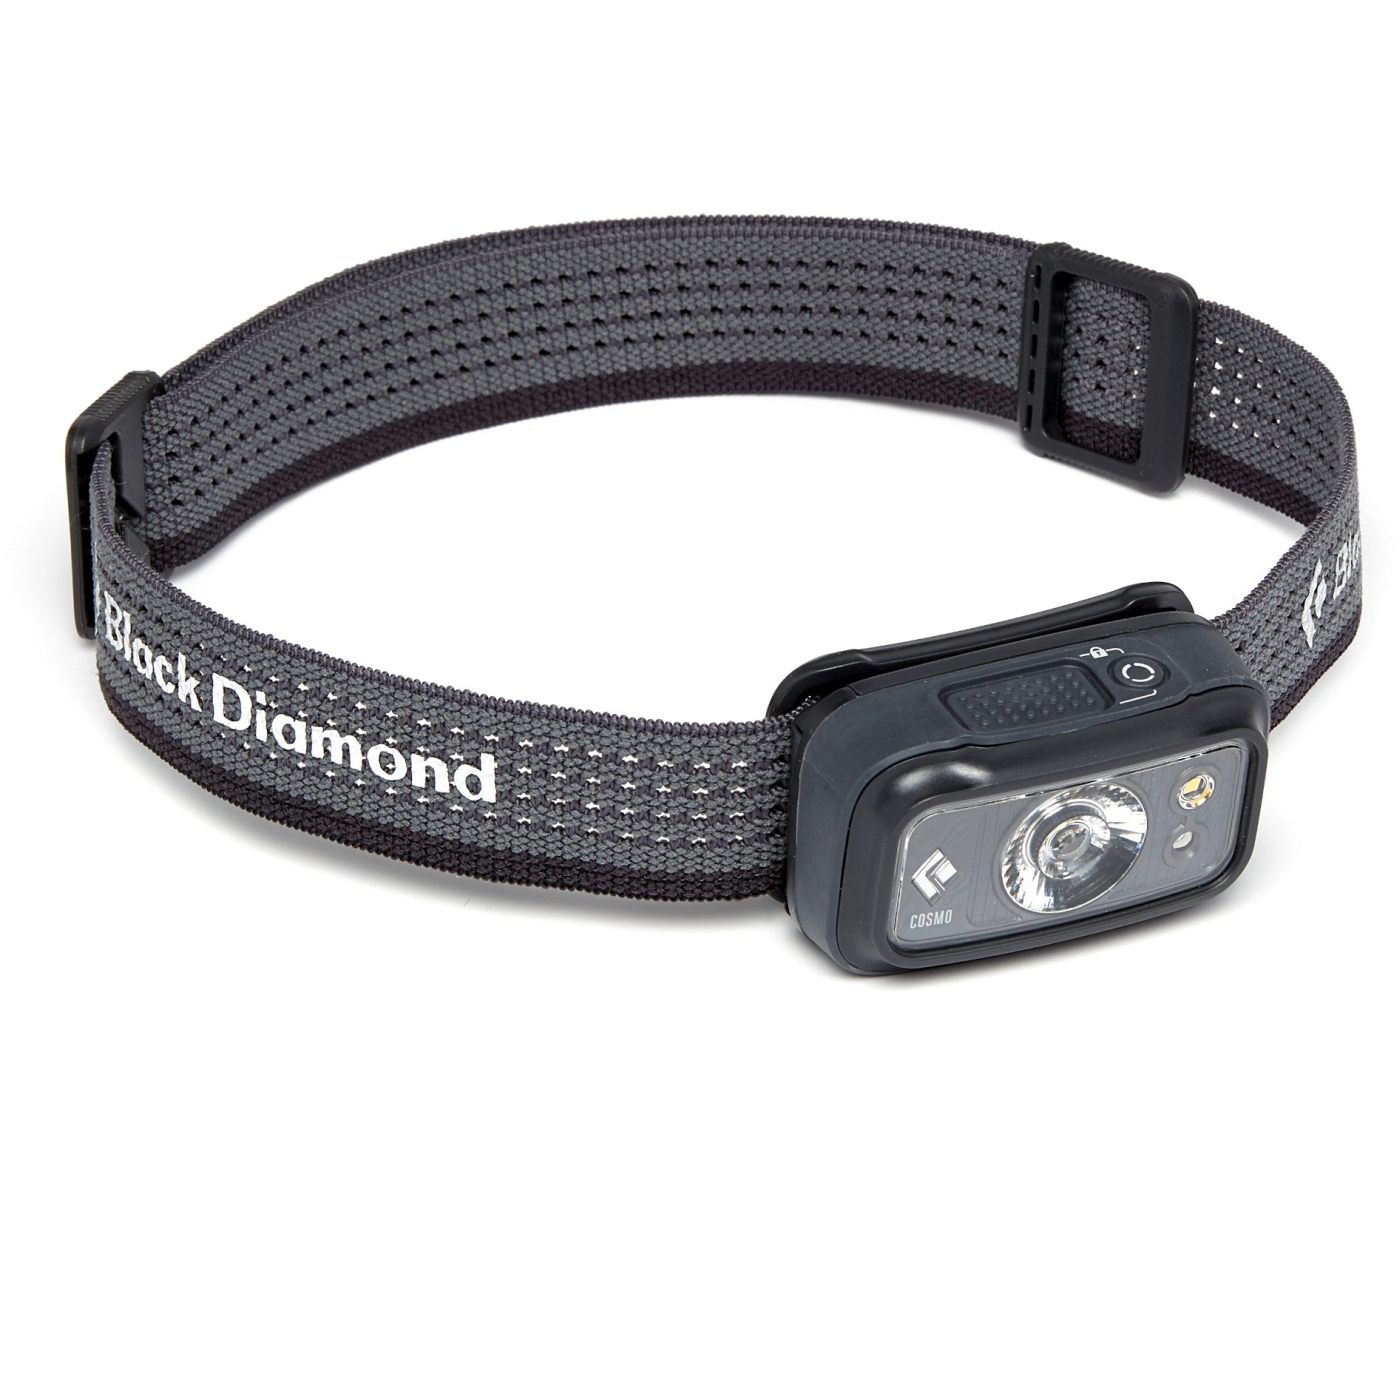 Black Diamond Cosmo 300 Headlamp - Graphite